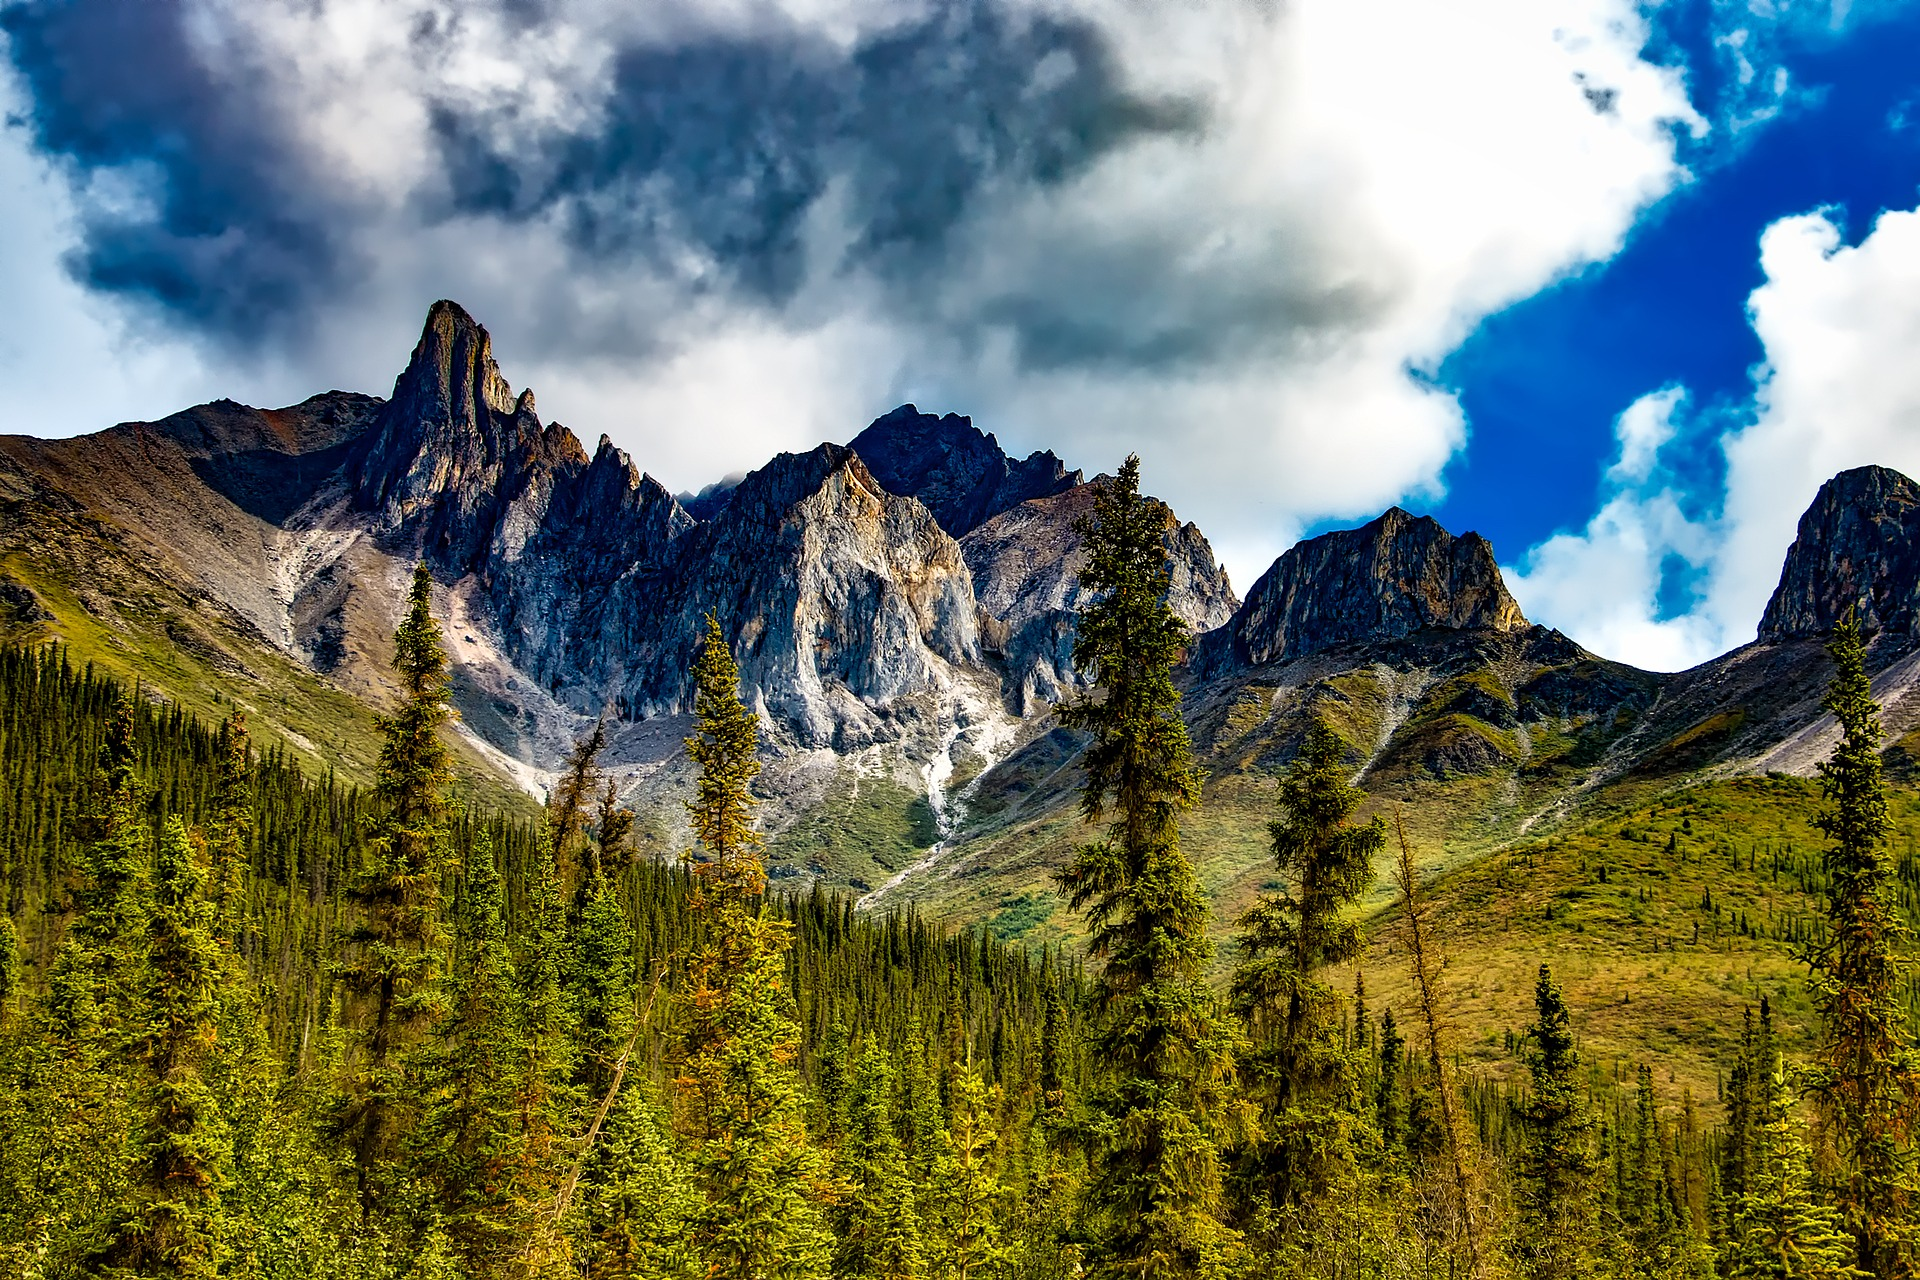 Mountain peaks in Yosemite National Park in California, USA